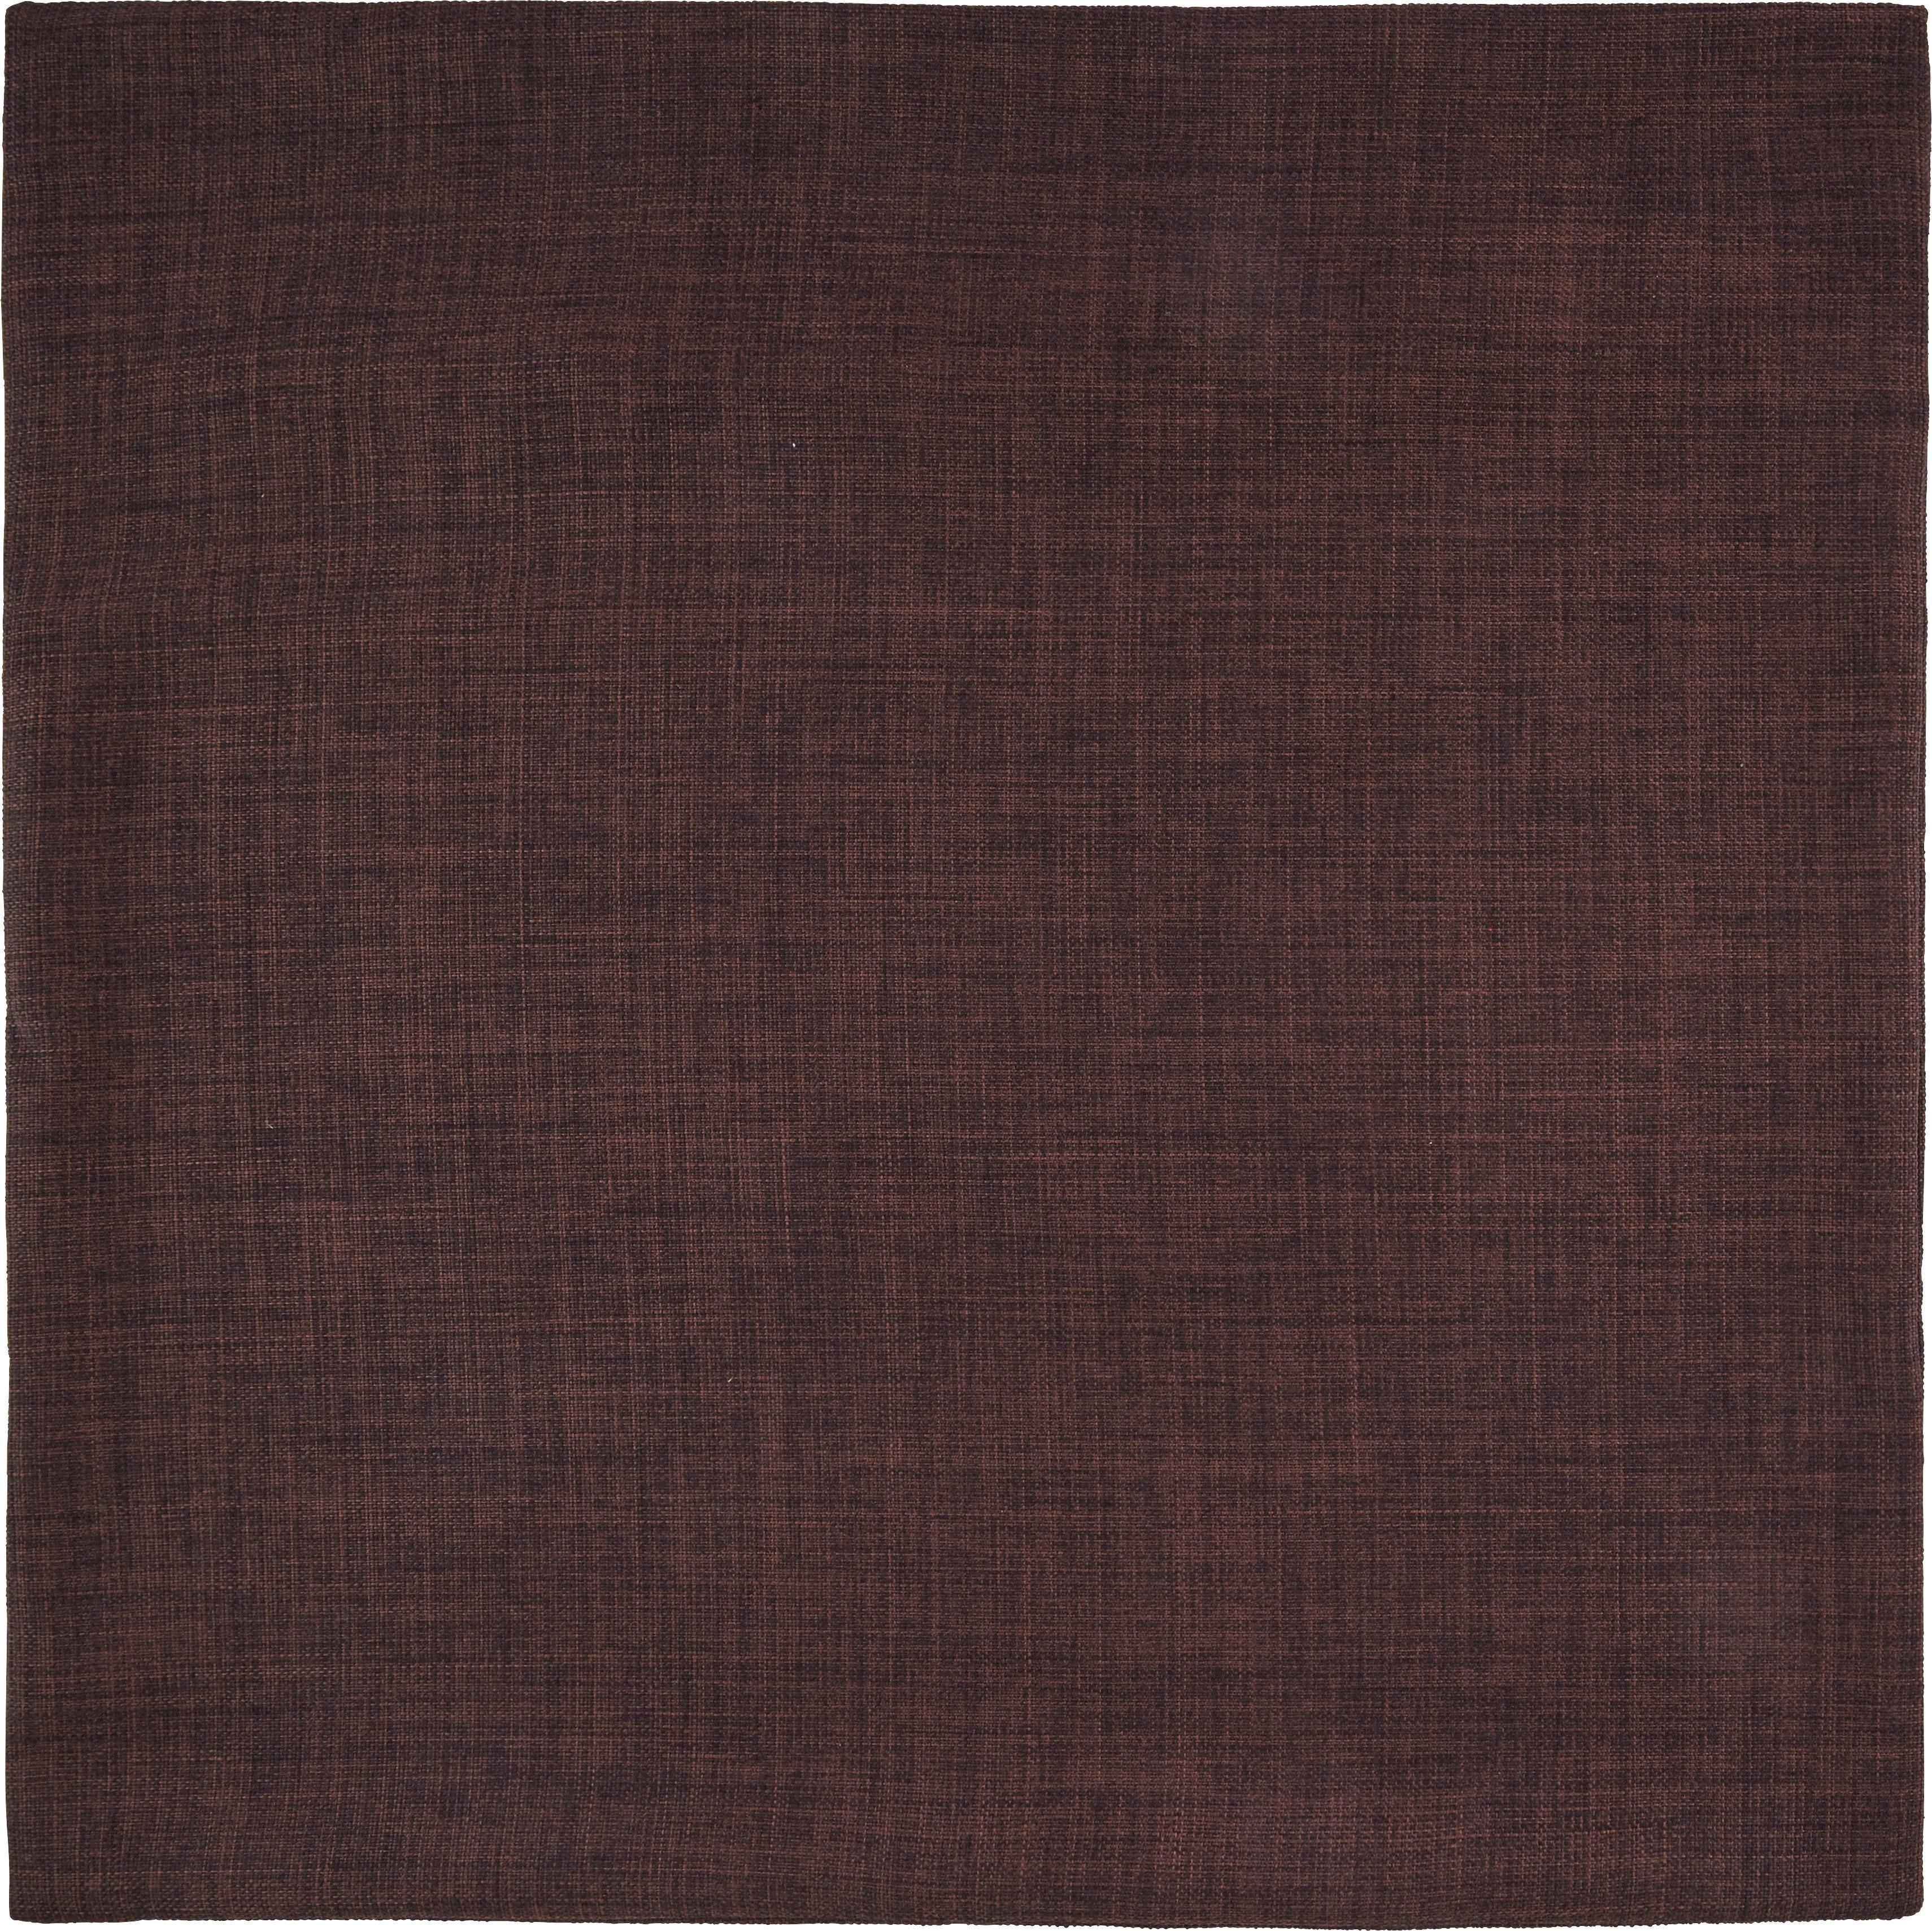 Párnahuzat Leinenoptik - barna, konvencionális, textil (60/60cm) - MÖMAX modern living